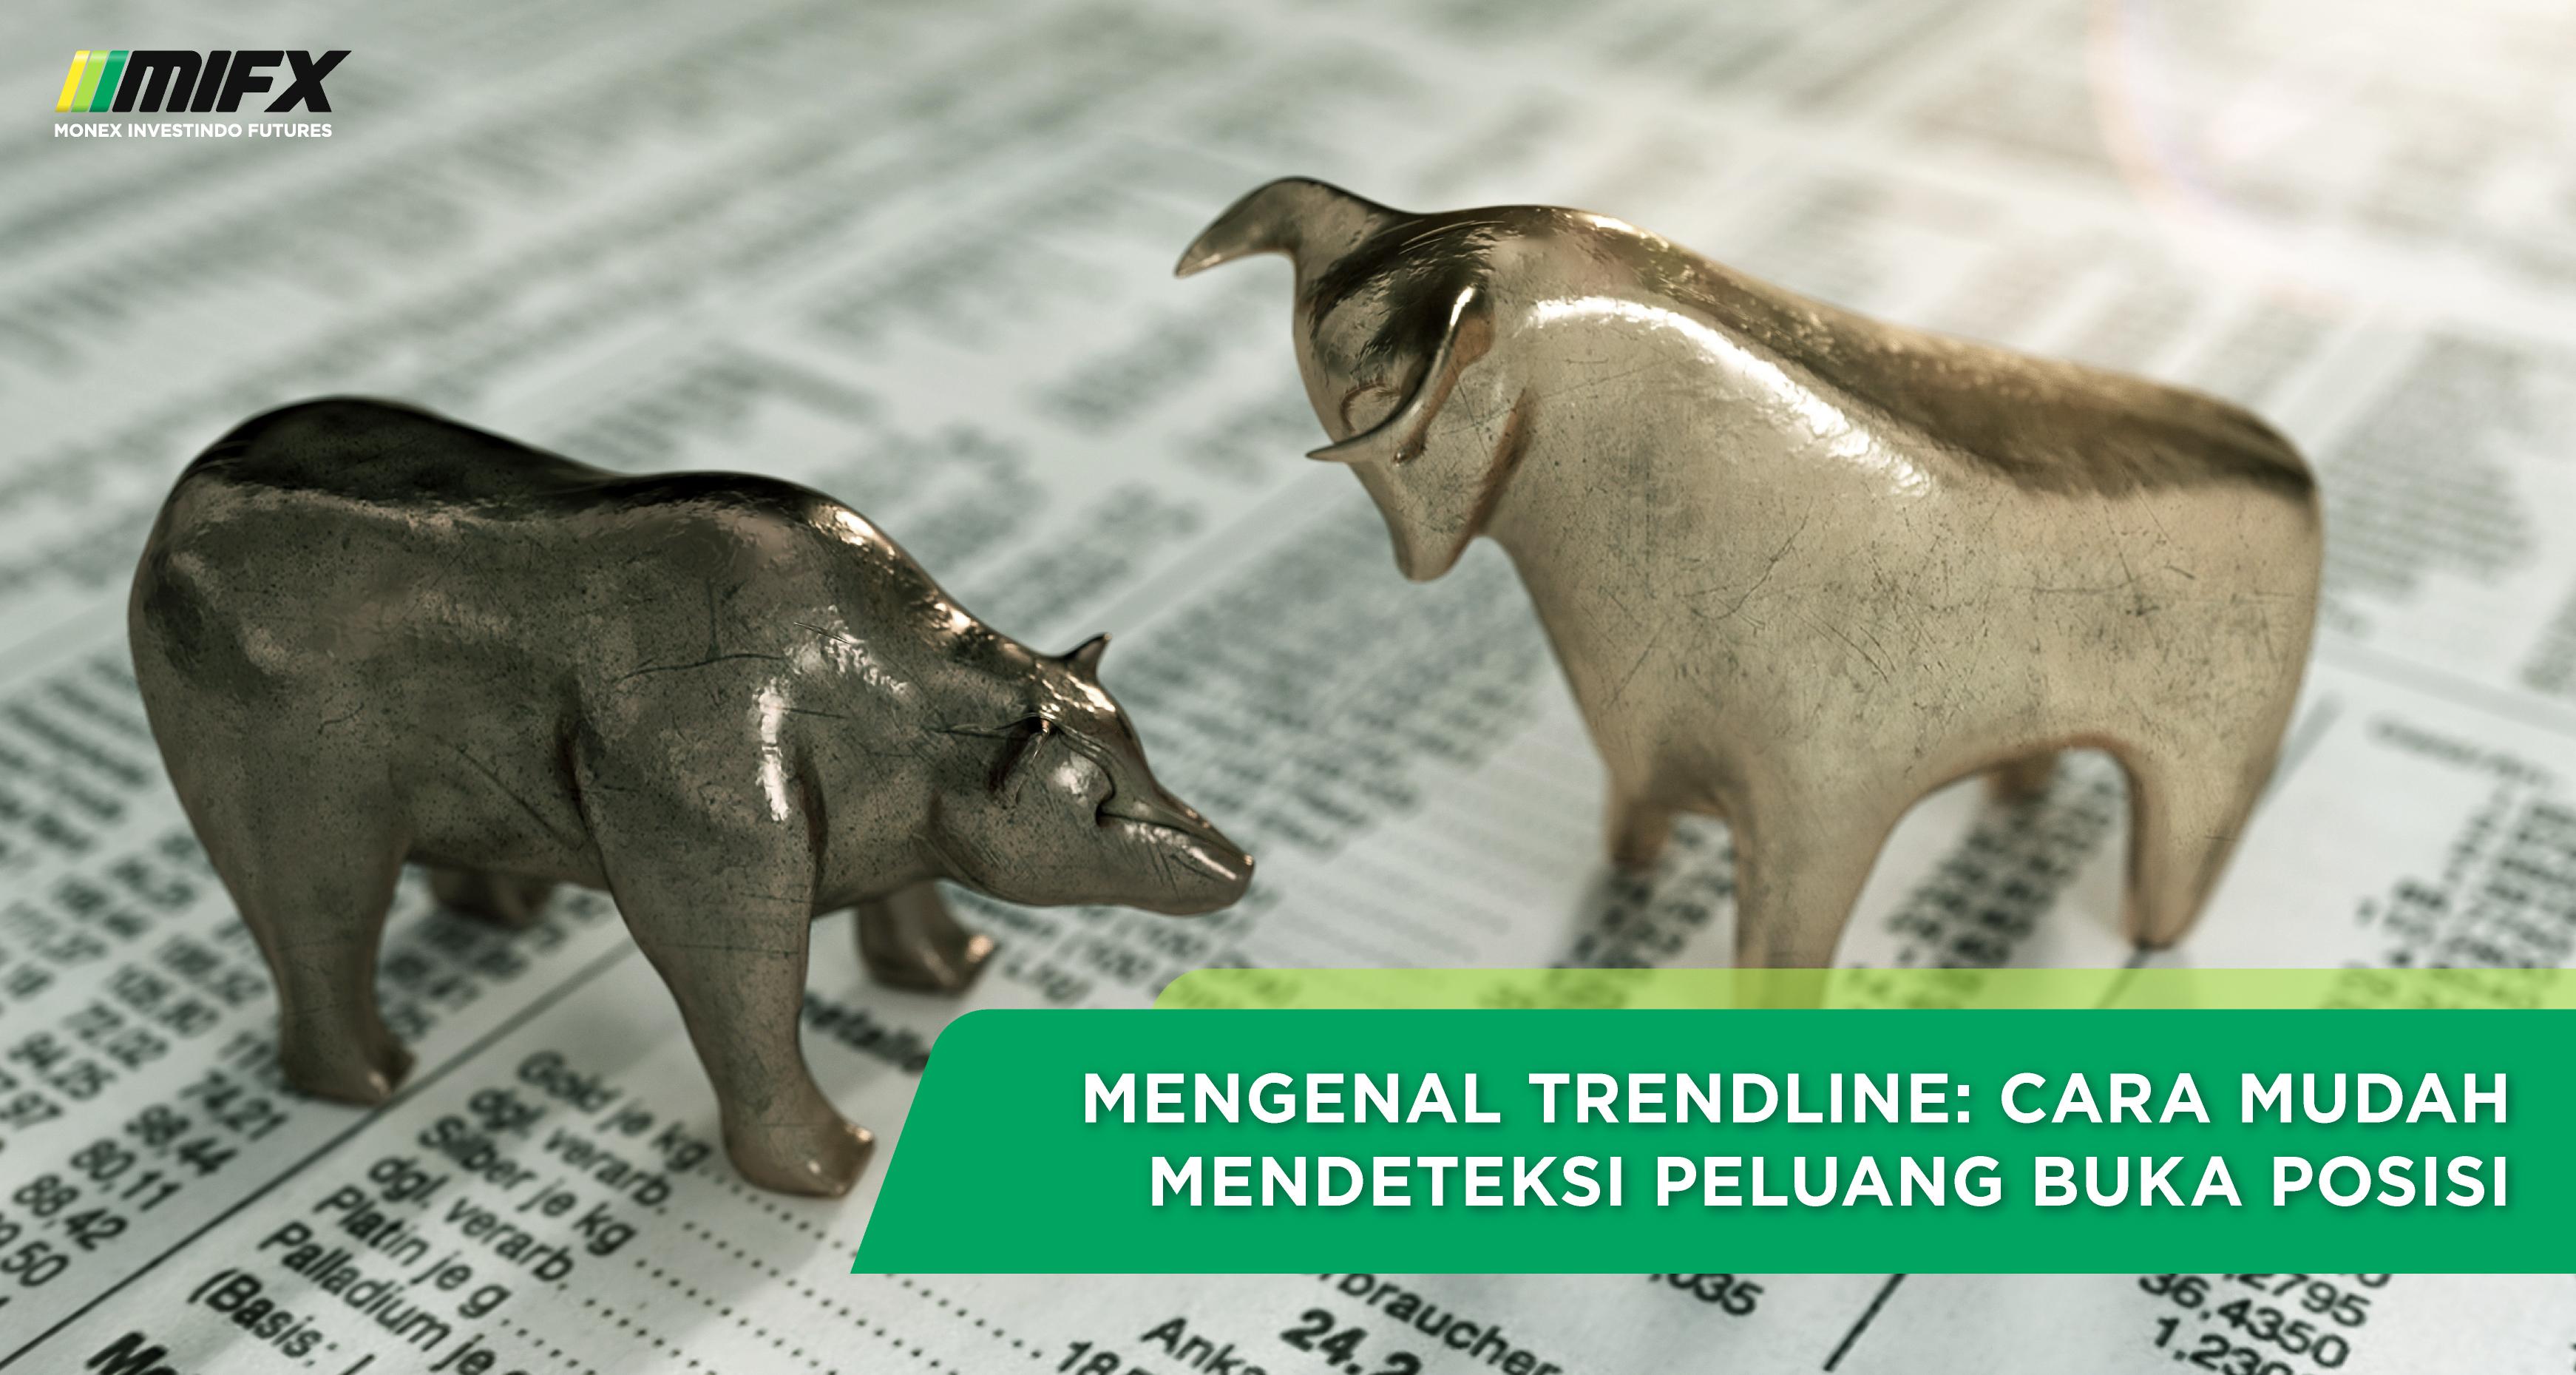 -article-05-mengenal-trendline1605594872.jpg